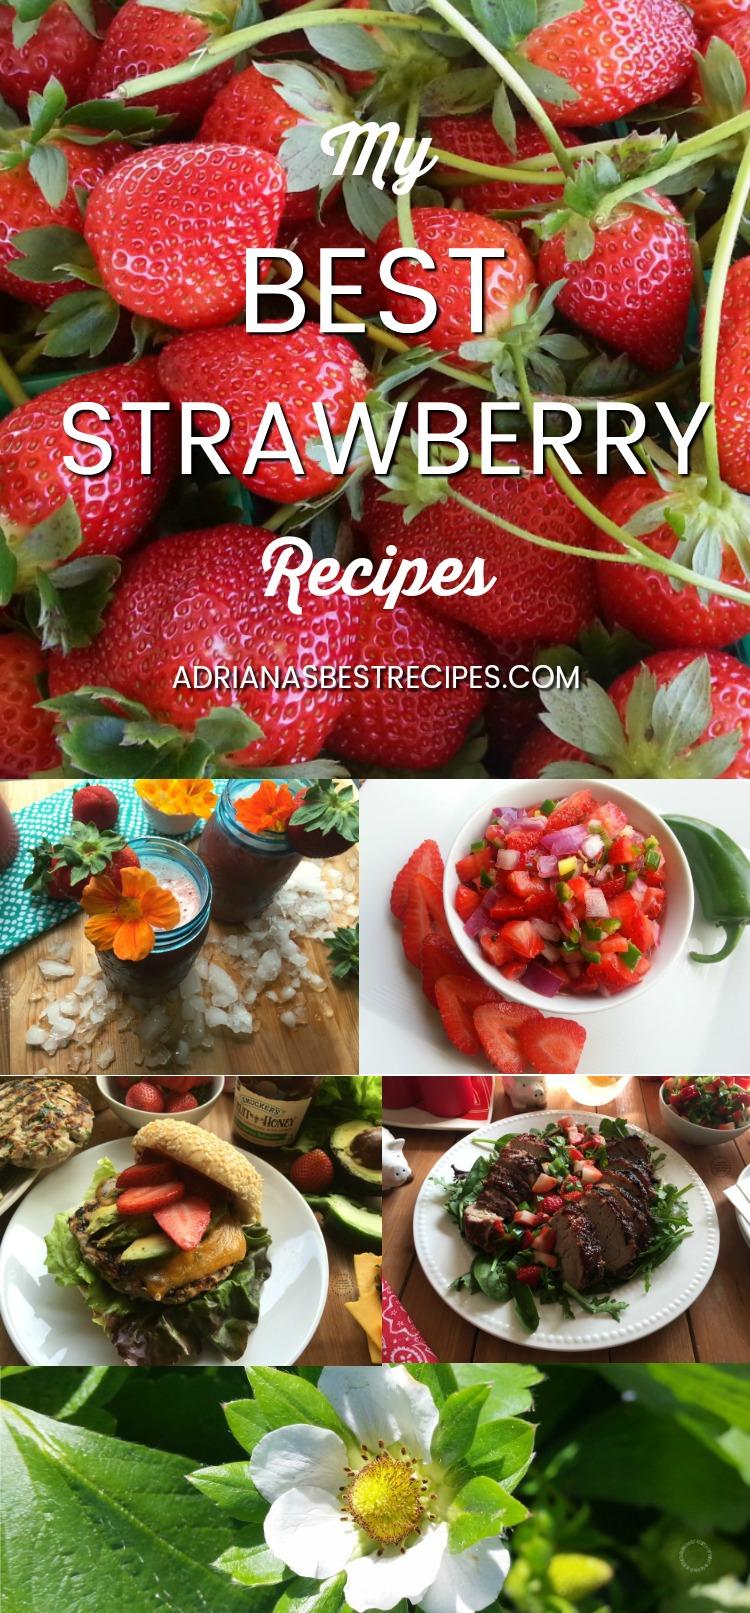 My Best Strawberry Recipes